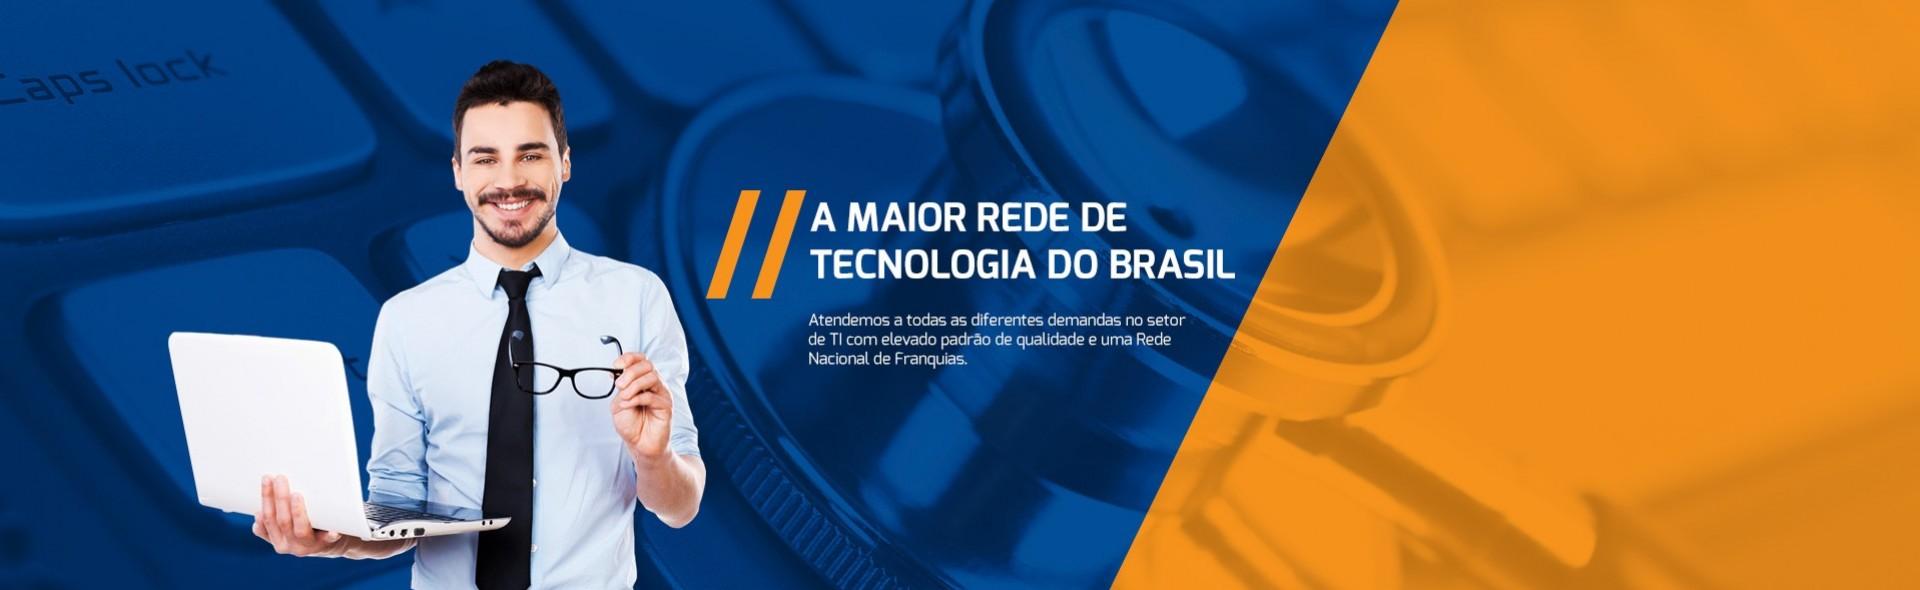 Banner Testeira 1